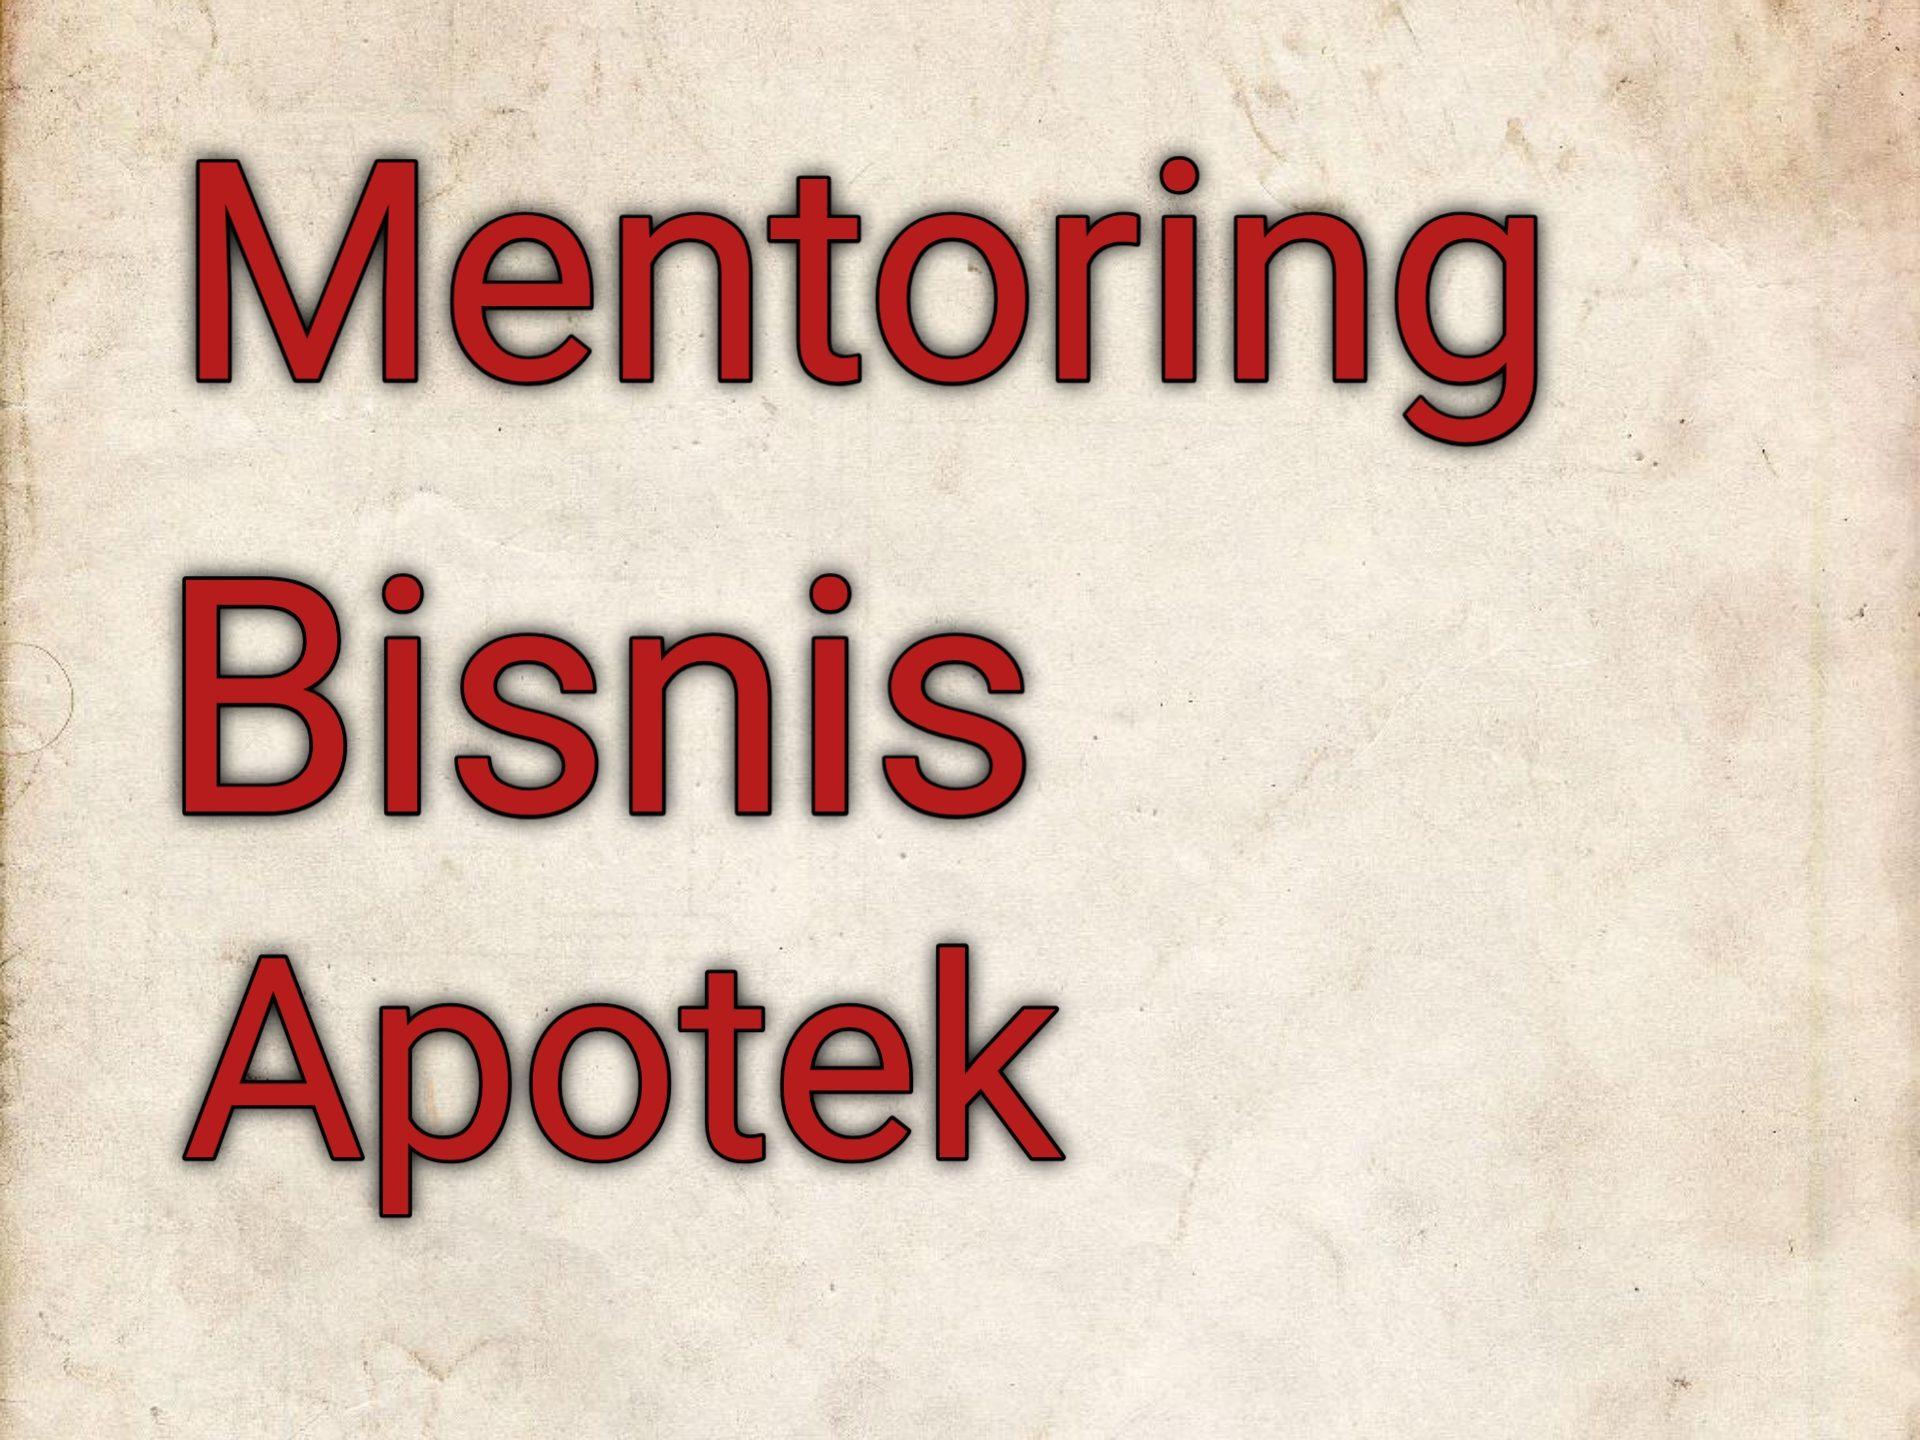 Mentoring Bisnis Apotek